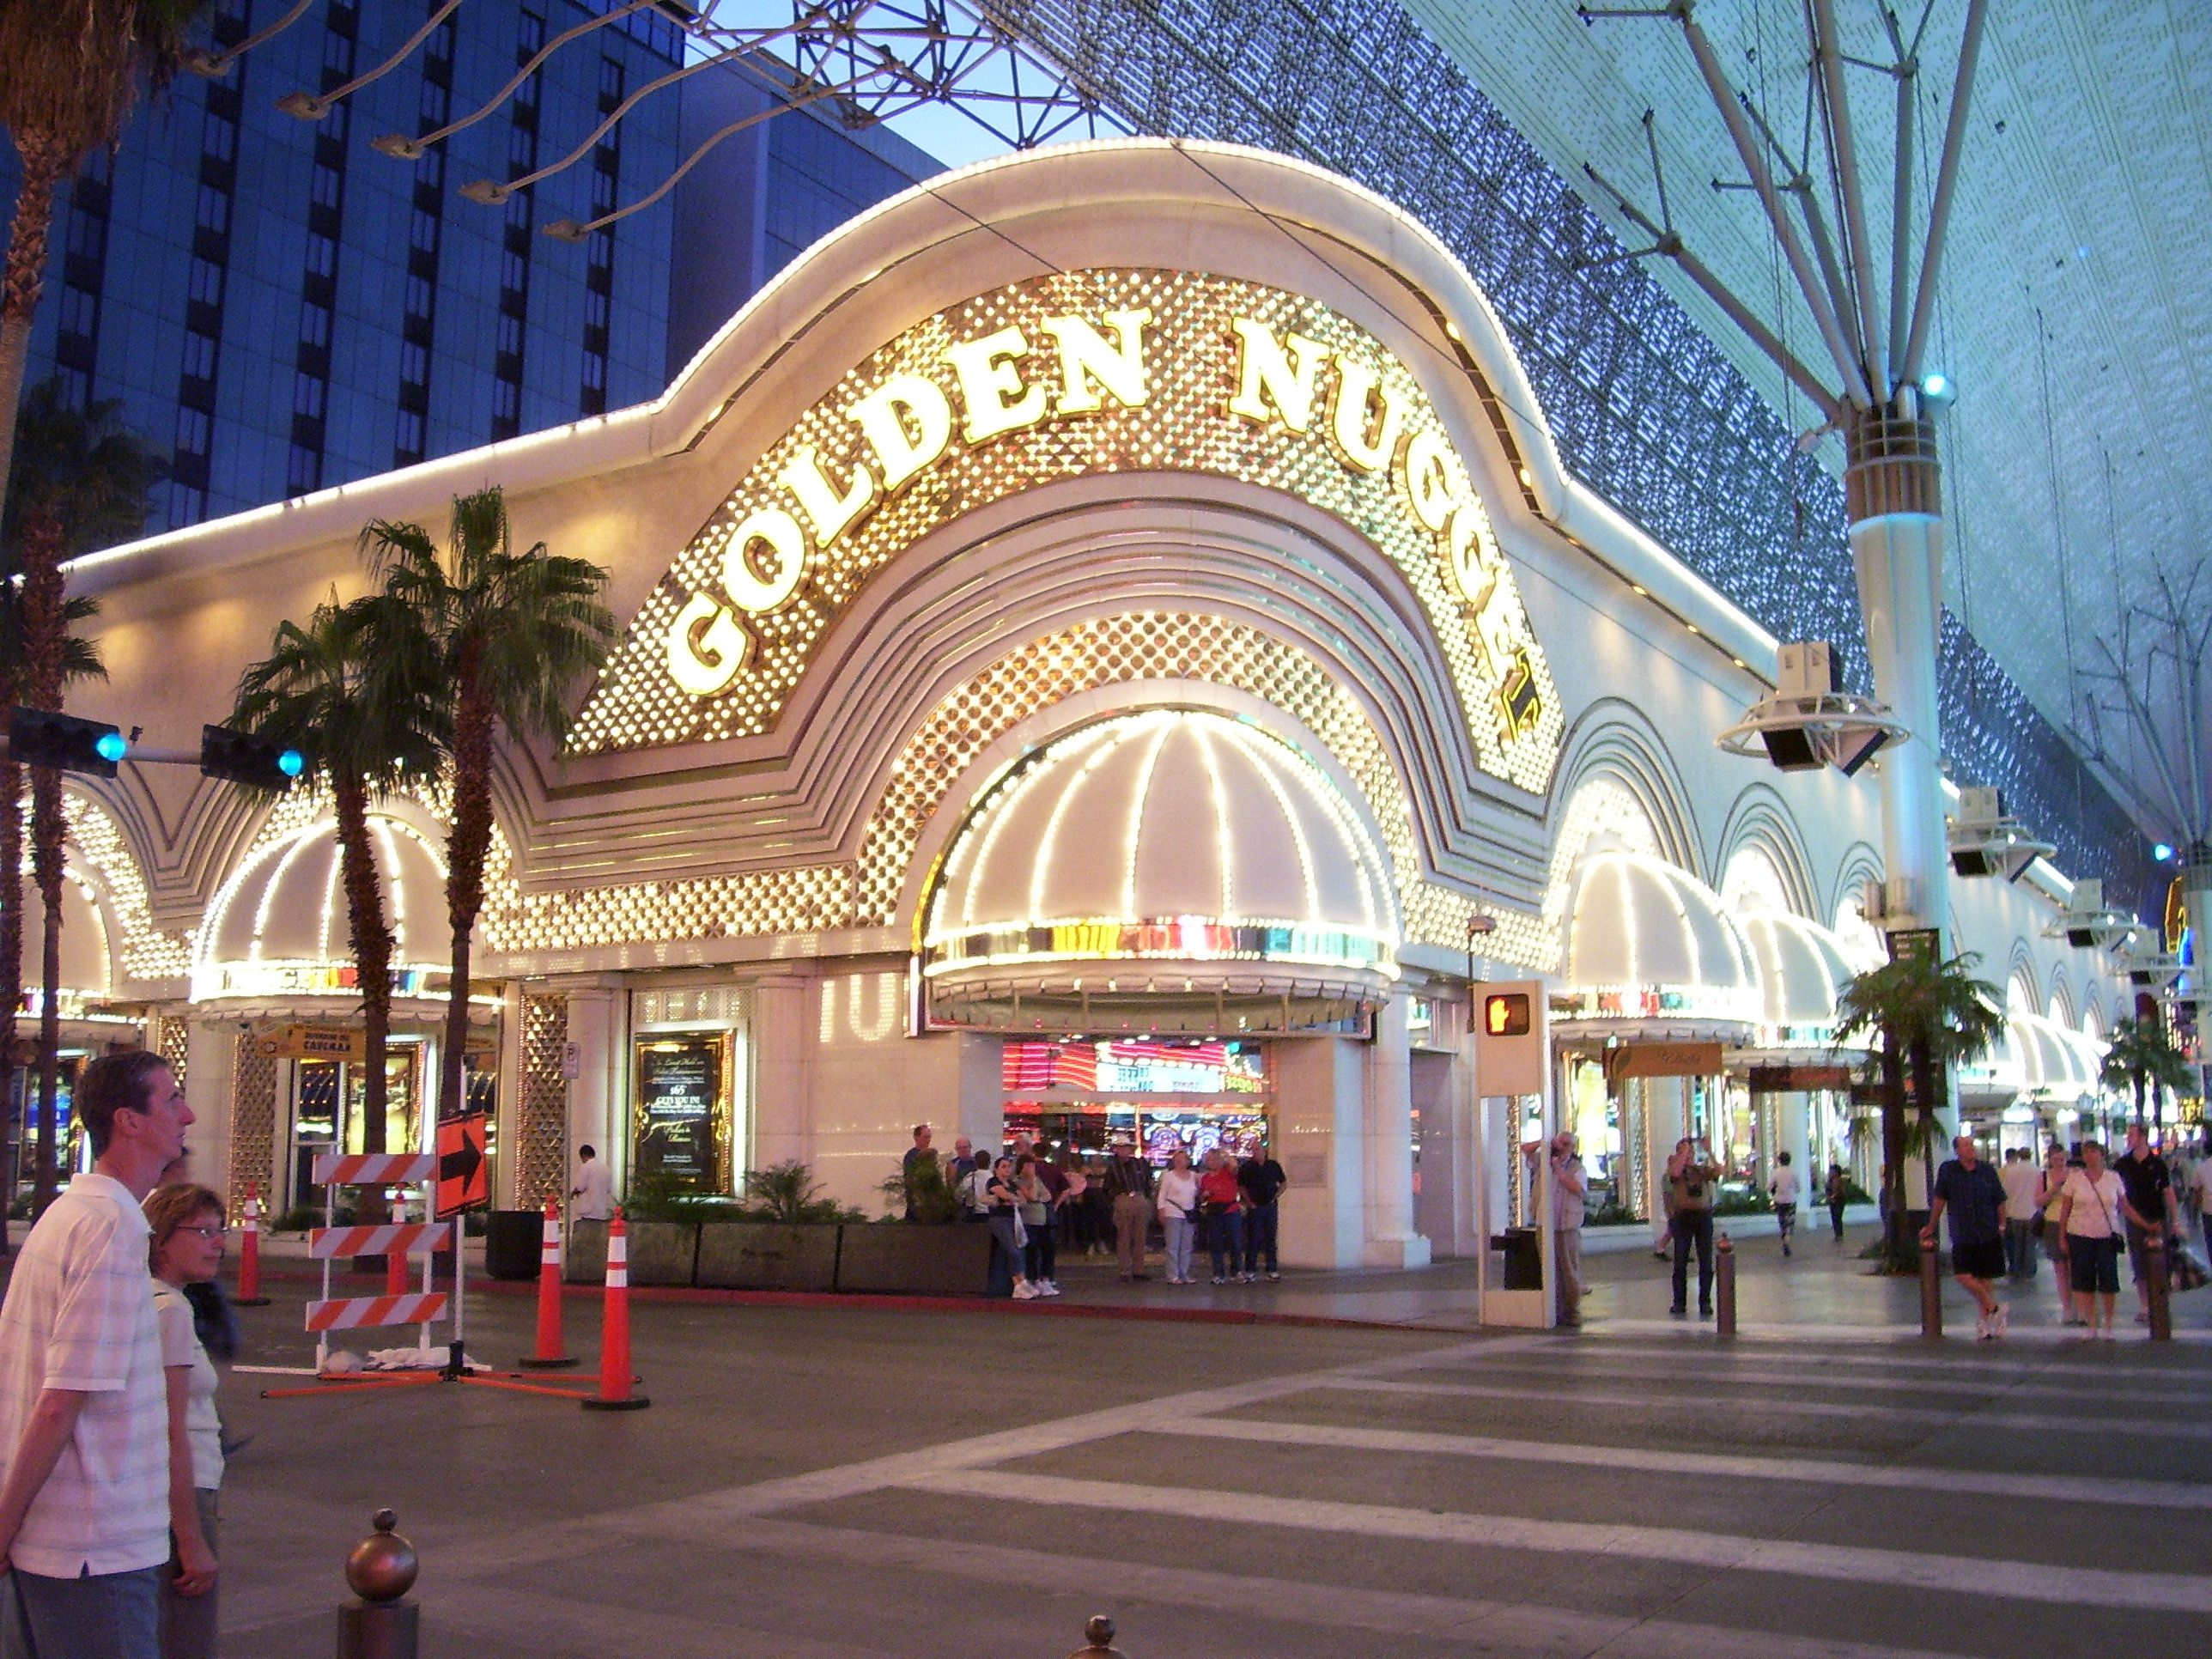 Golden Nugget Hotel And Casino Freemont Street Las Vegas